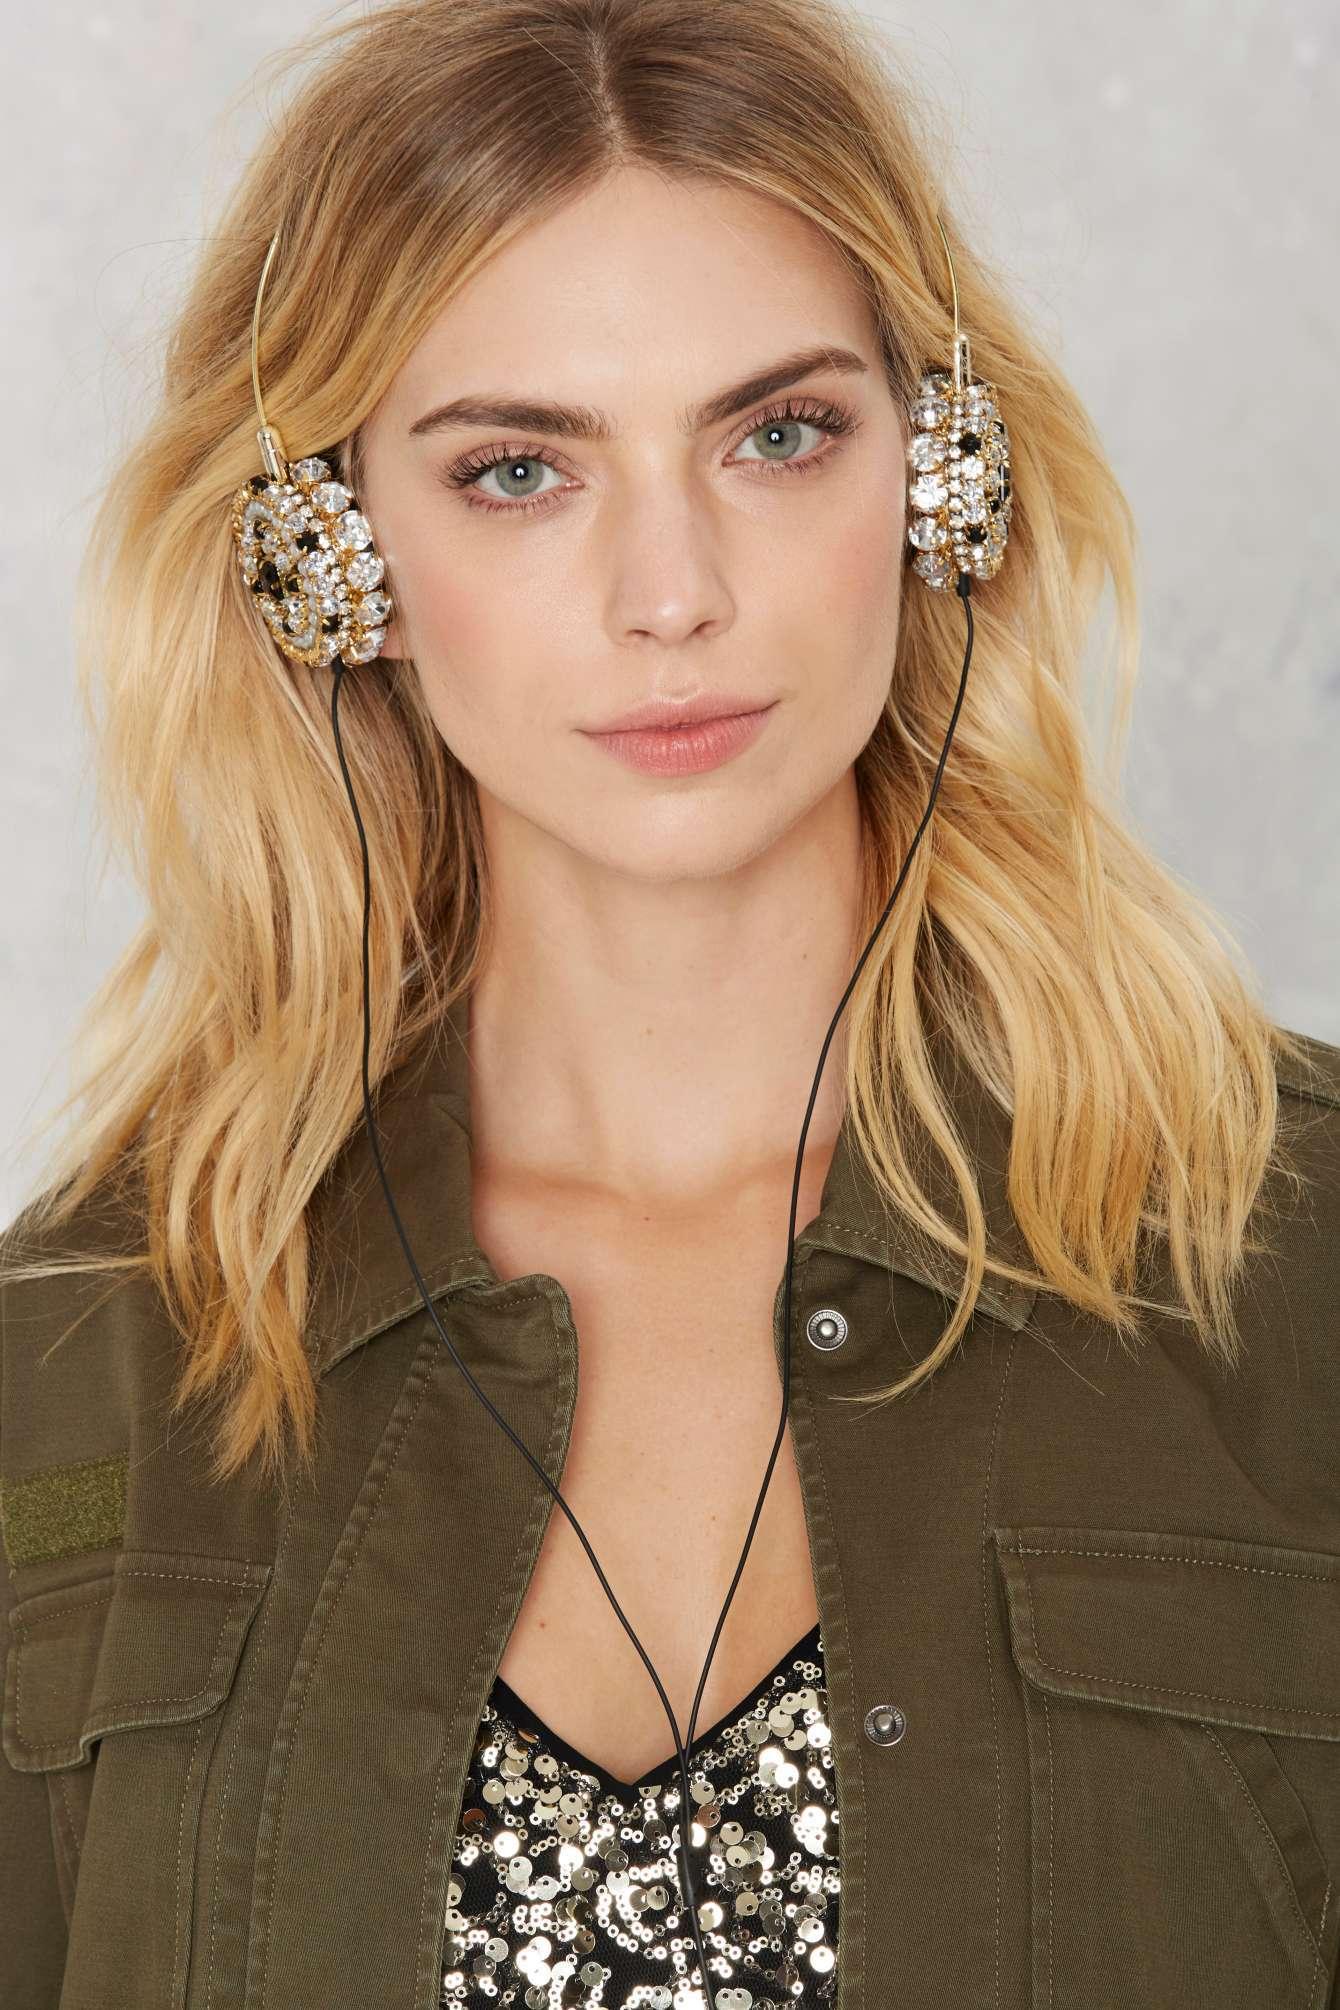 Nasty-Gal-Skinnydip London-Zara -Martin- Bling-Headphones-